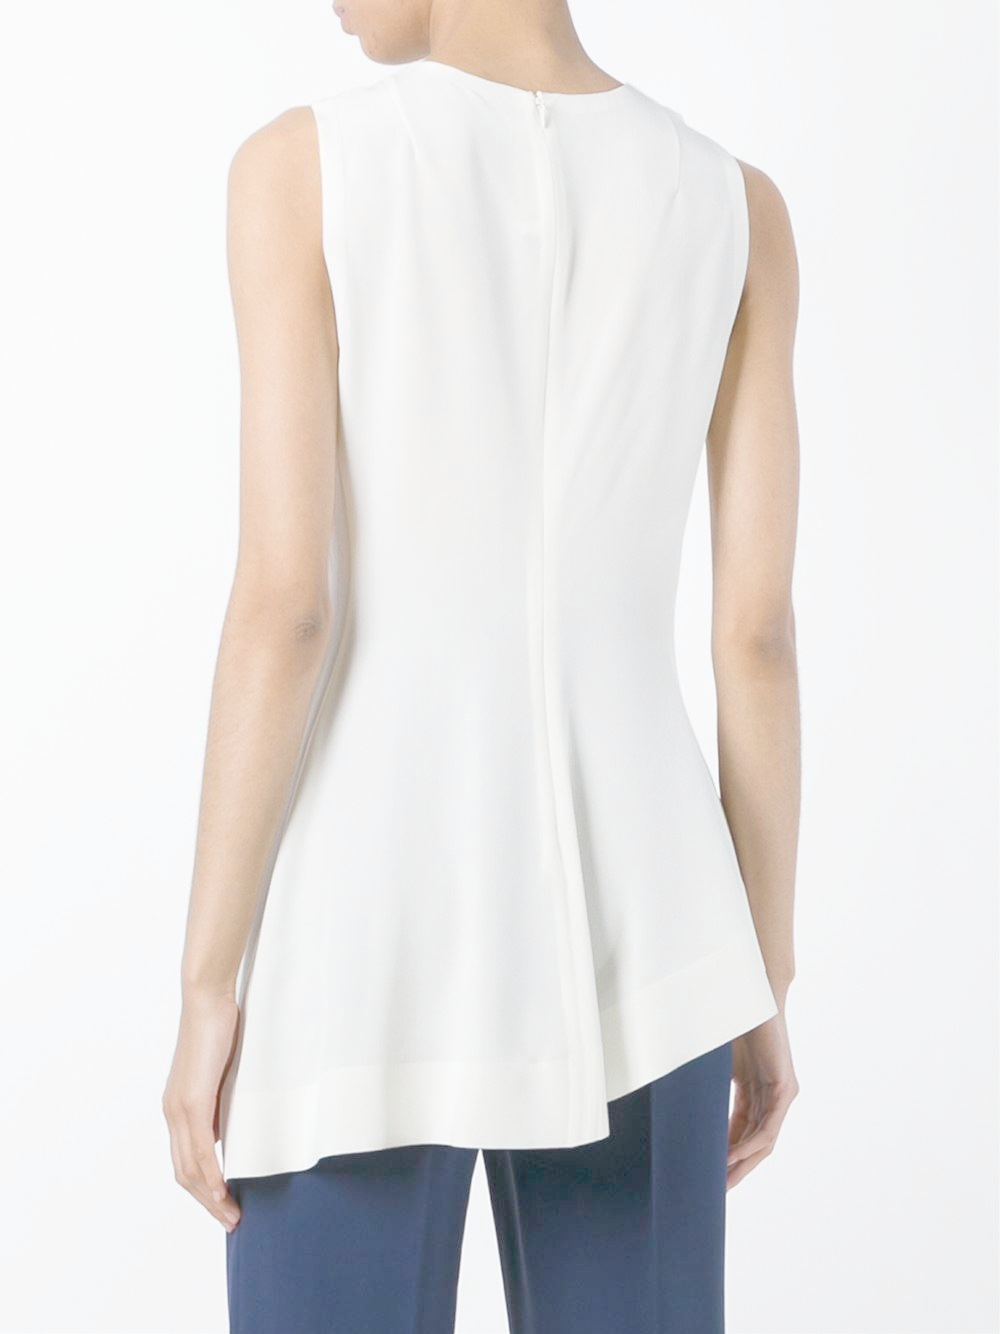 Marni Asymmetric Pleated Top in White